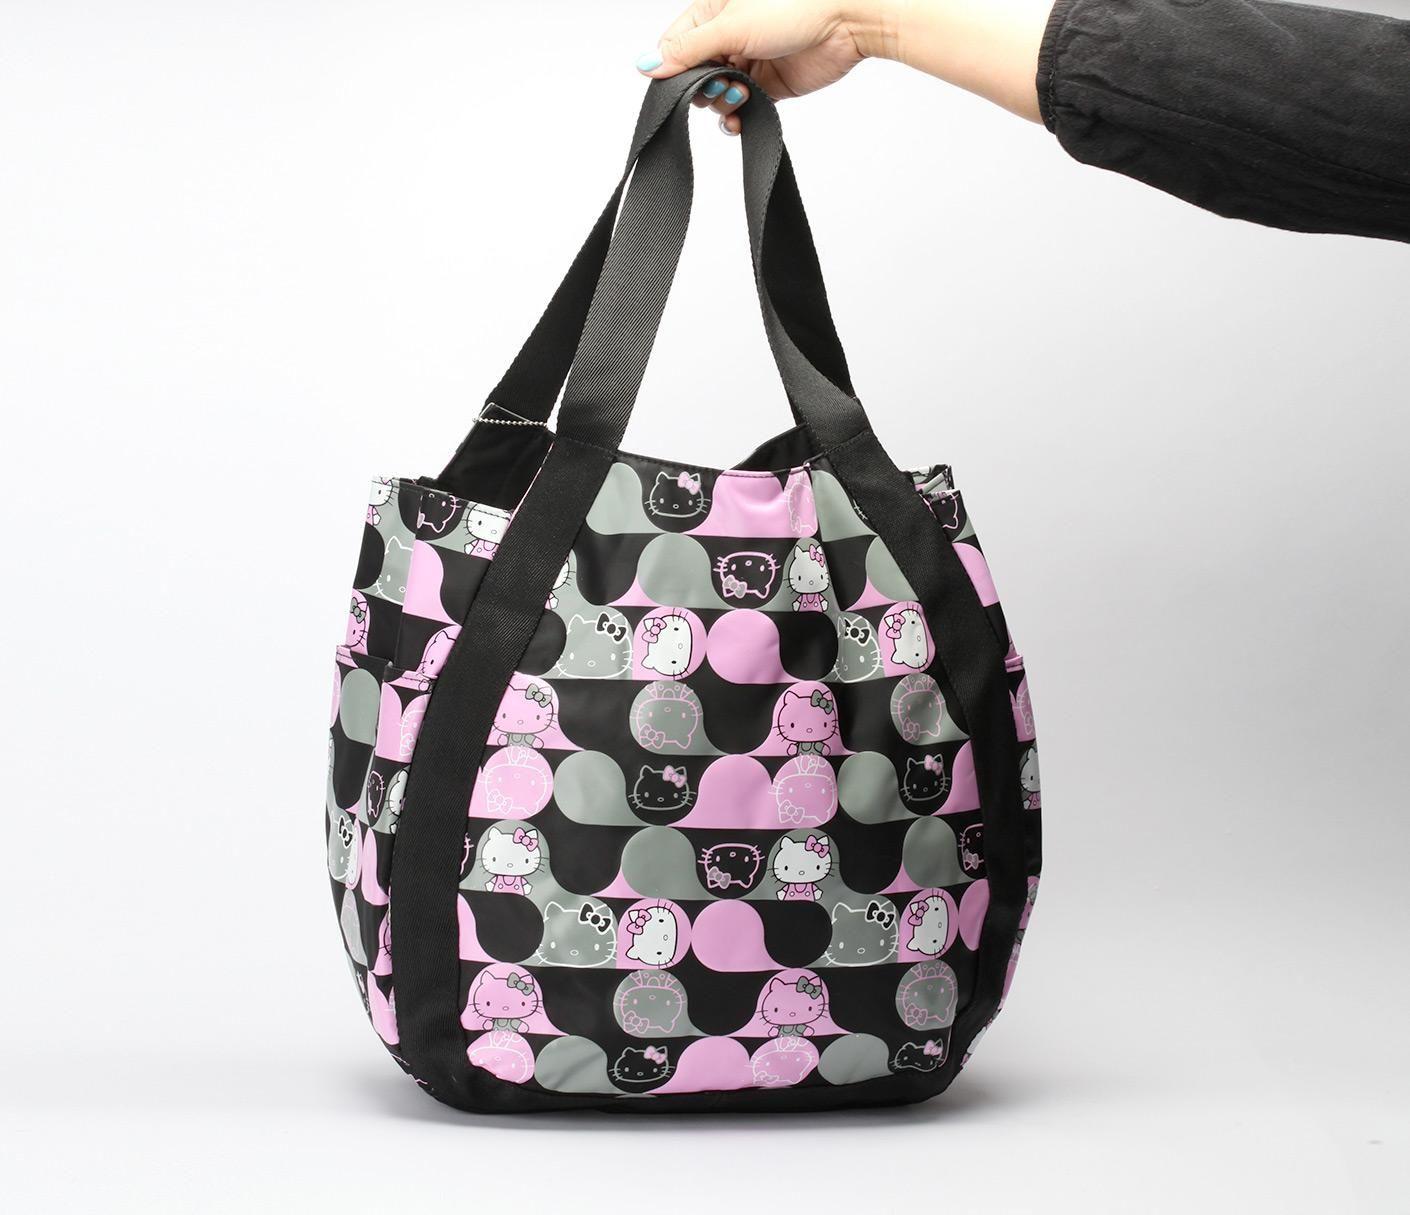 asics bag Pink